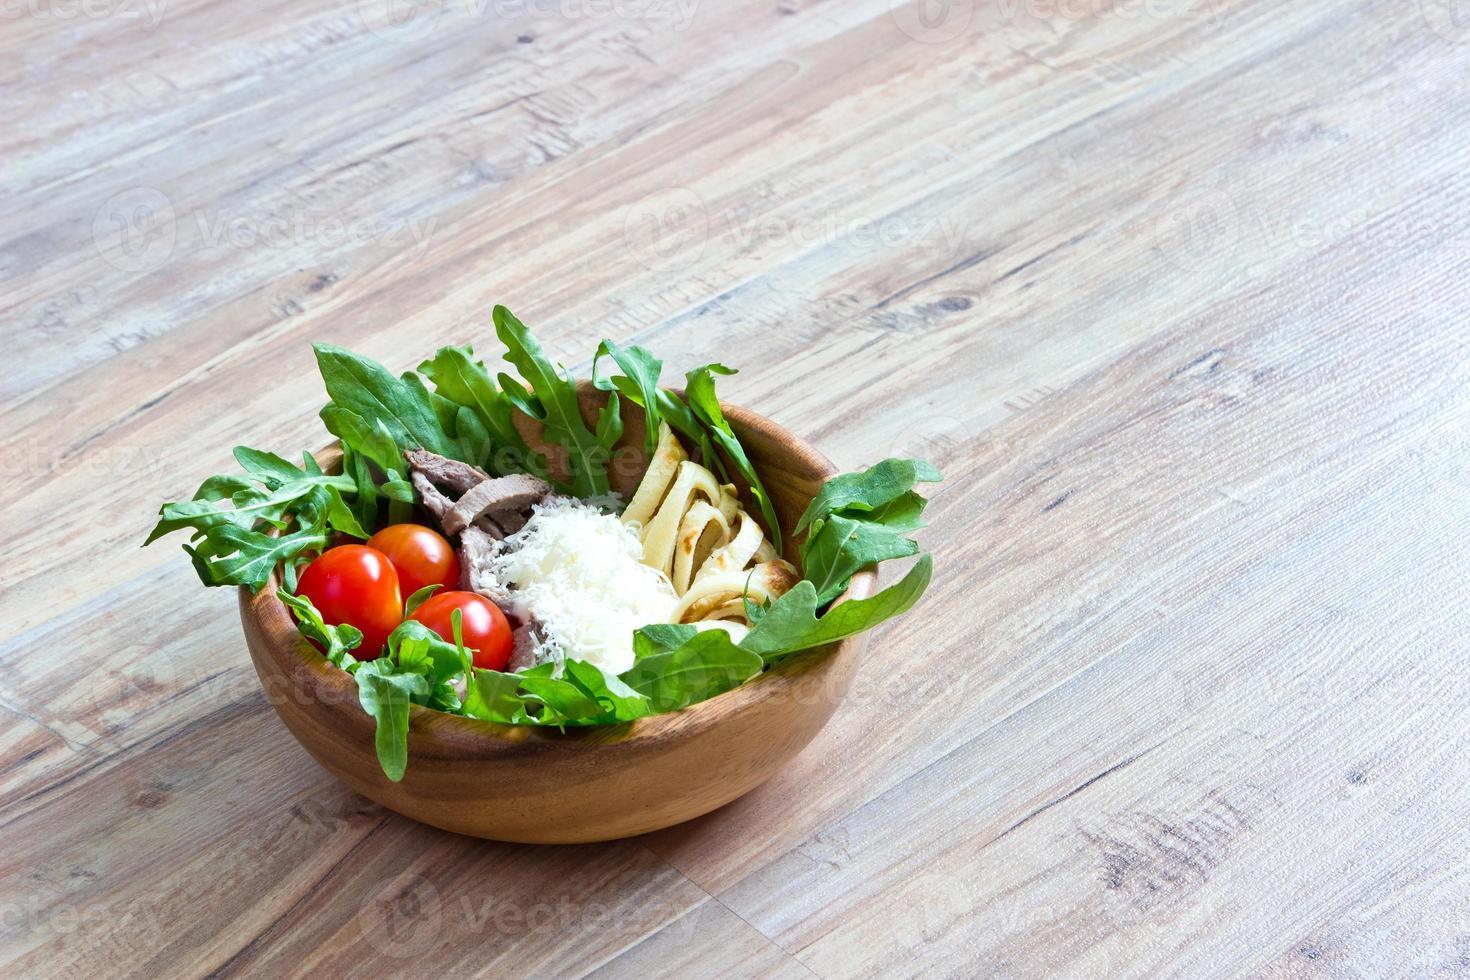 sallad med nötkötttunga, sallad, tomater, ost, äggröra foto